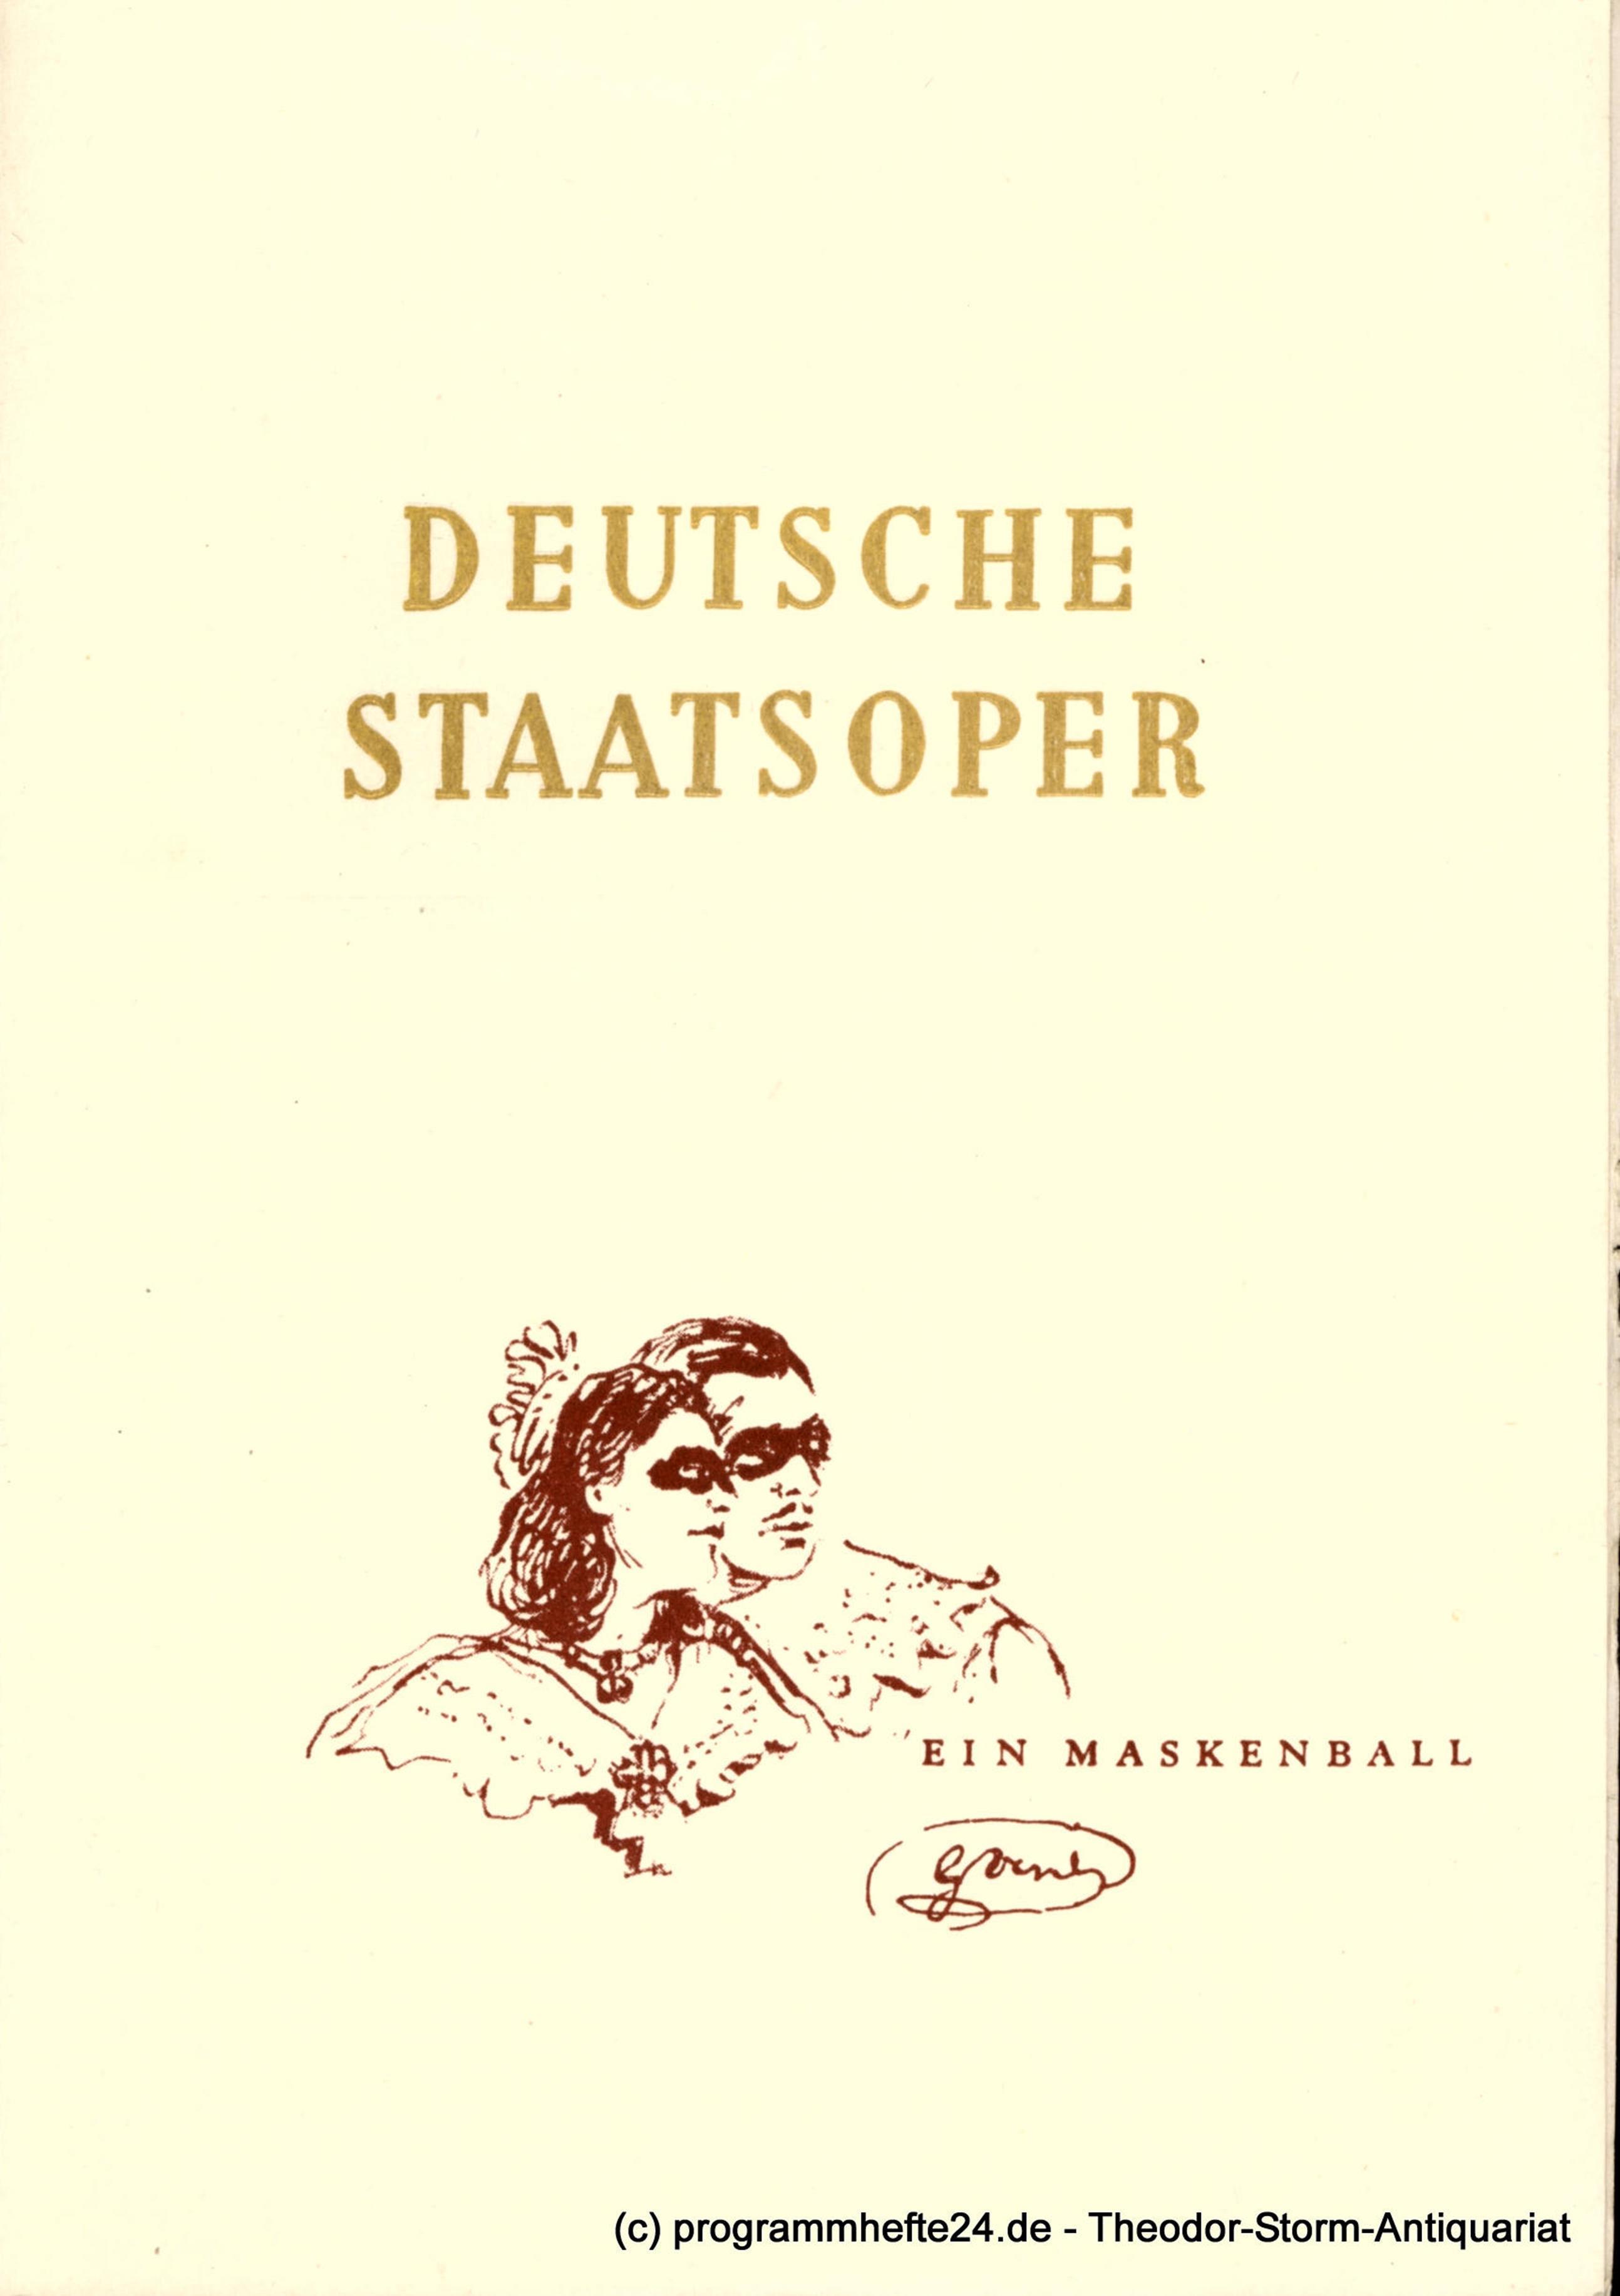 Programmheft Ein Maskenball. Deutsche Staatsoper Berlin 1951